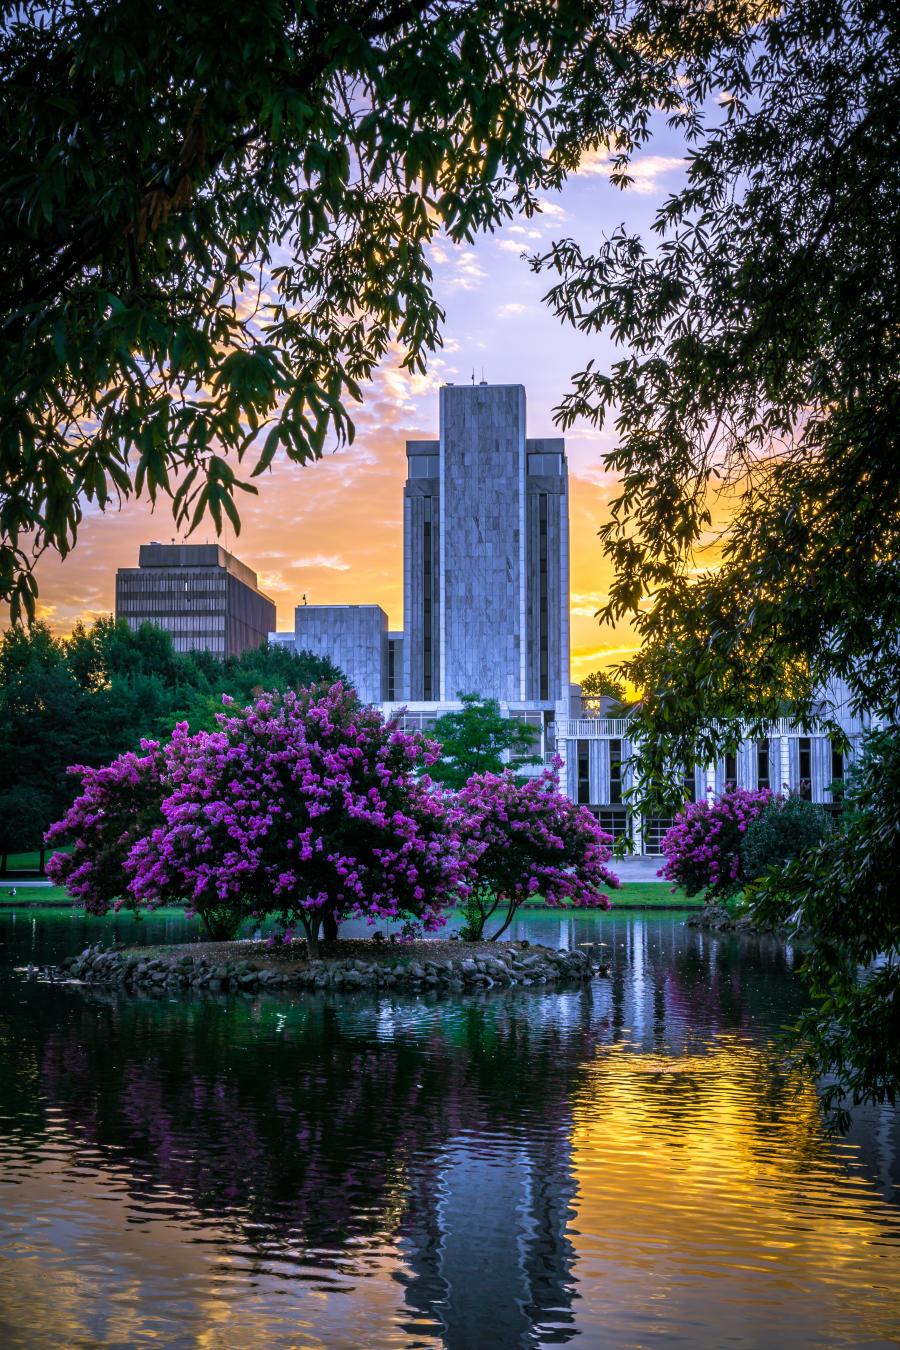 Springtime flowers paint the landscape of Big Spring Park near the Huntsville City Hall.